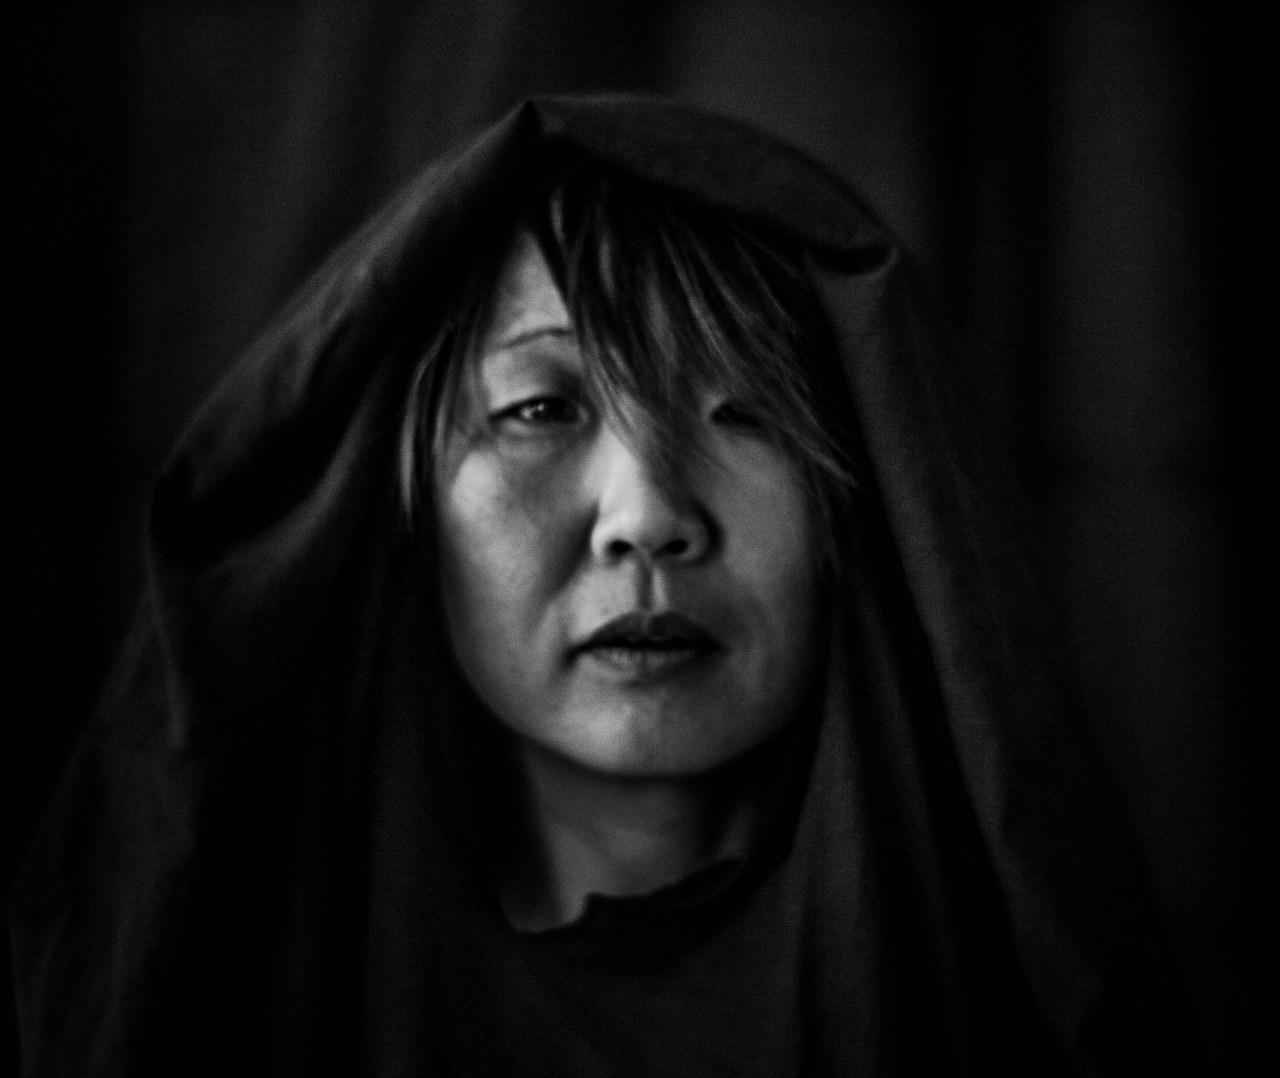 profileimg_YongSunGullach_ProjectLiminality_photographerKajsaGullberg